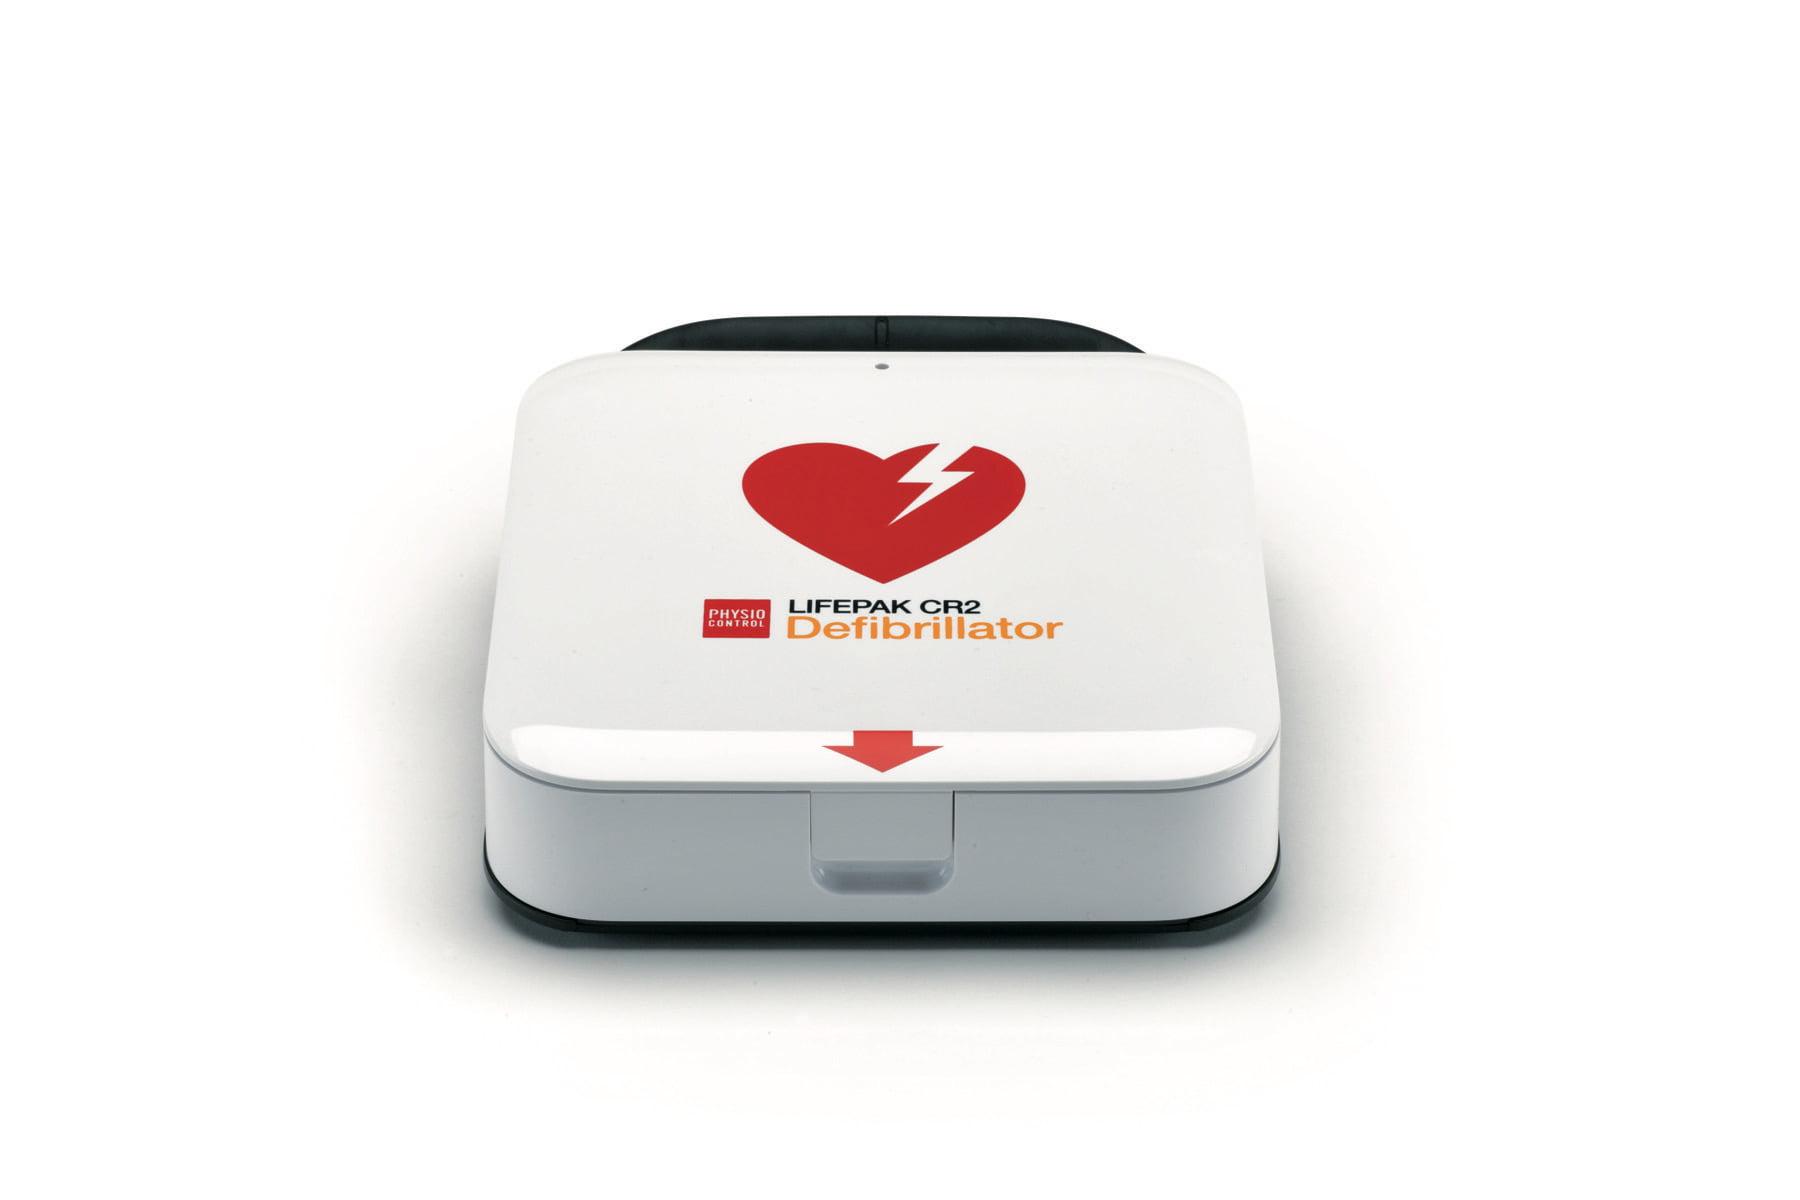 HLR hjärtstartare lifepak cr2